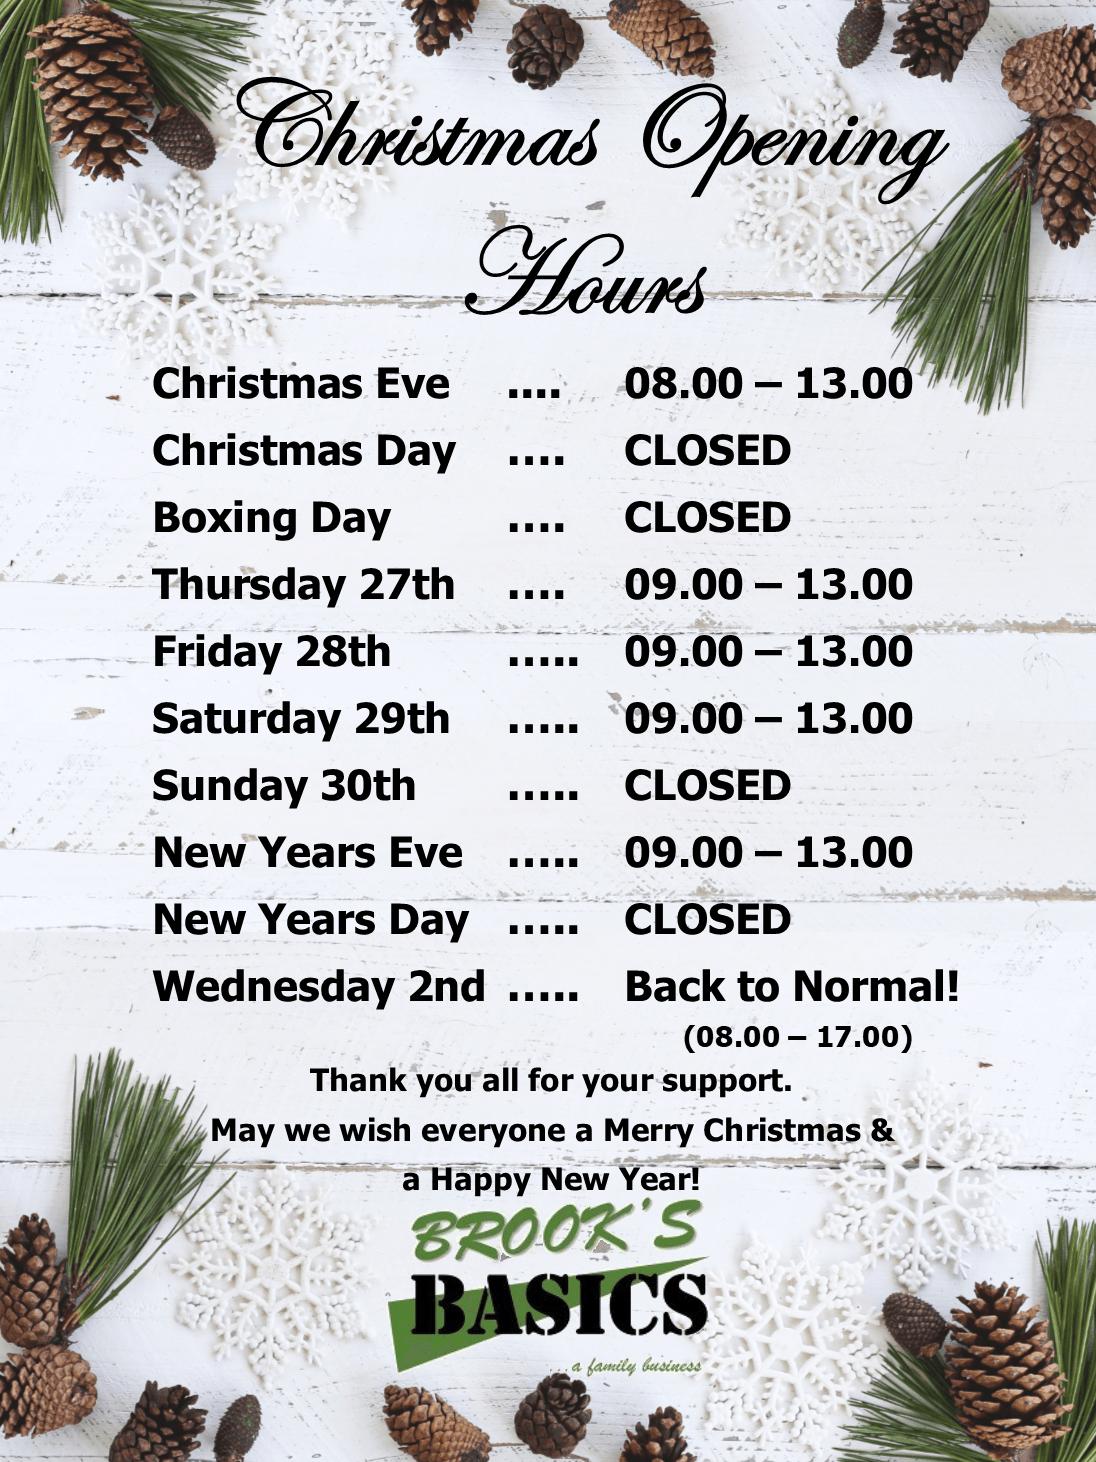 Christmas Opening Hours.Christmas Opening Hours 2018